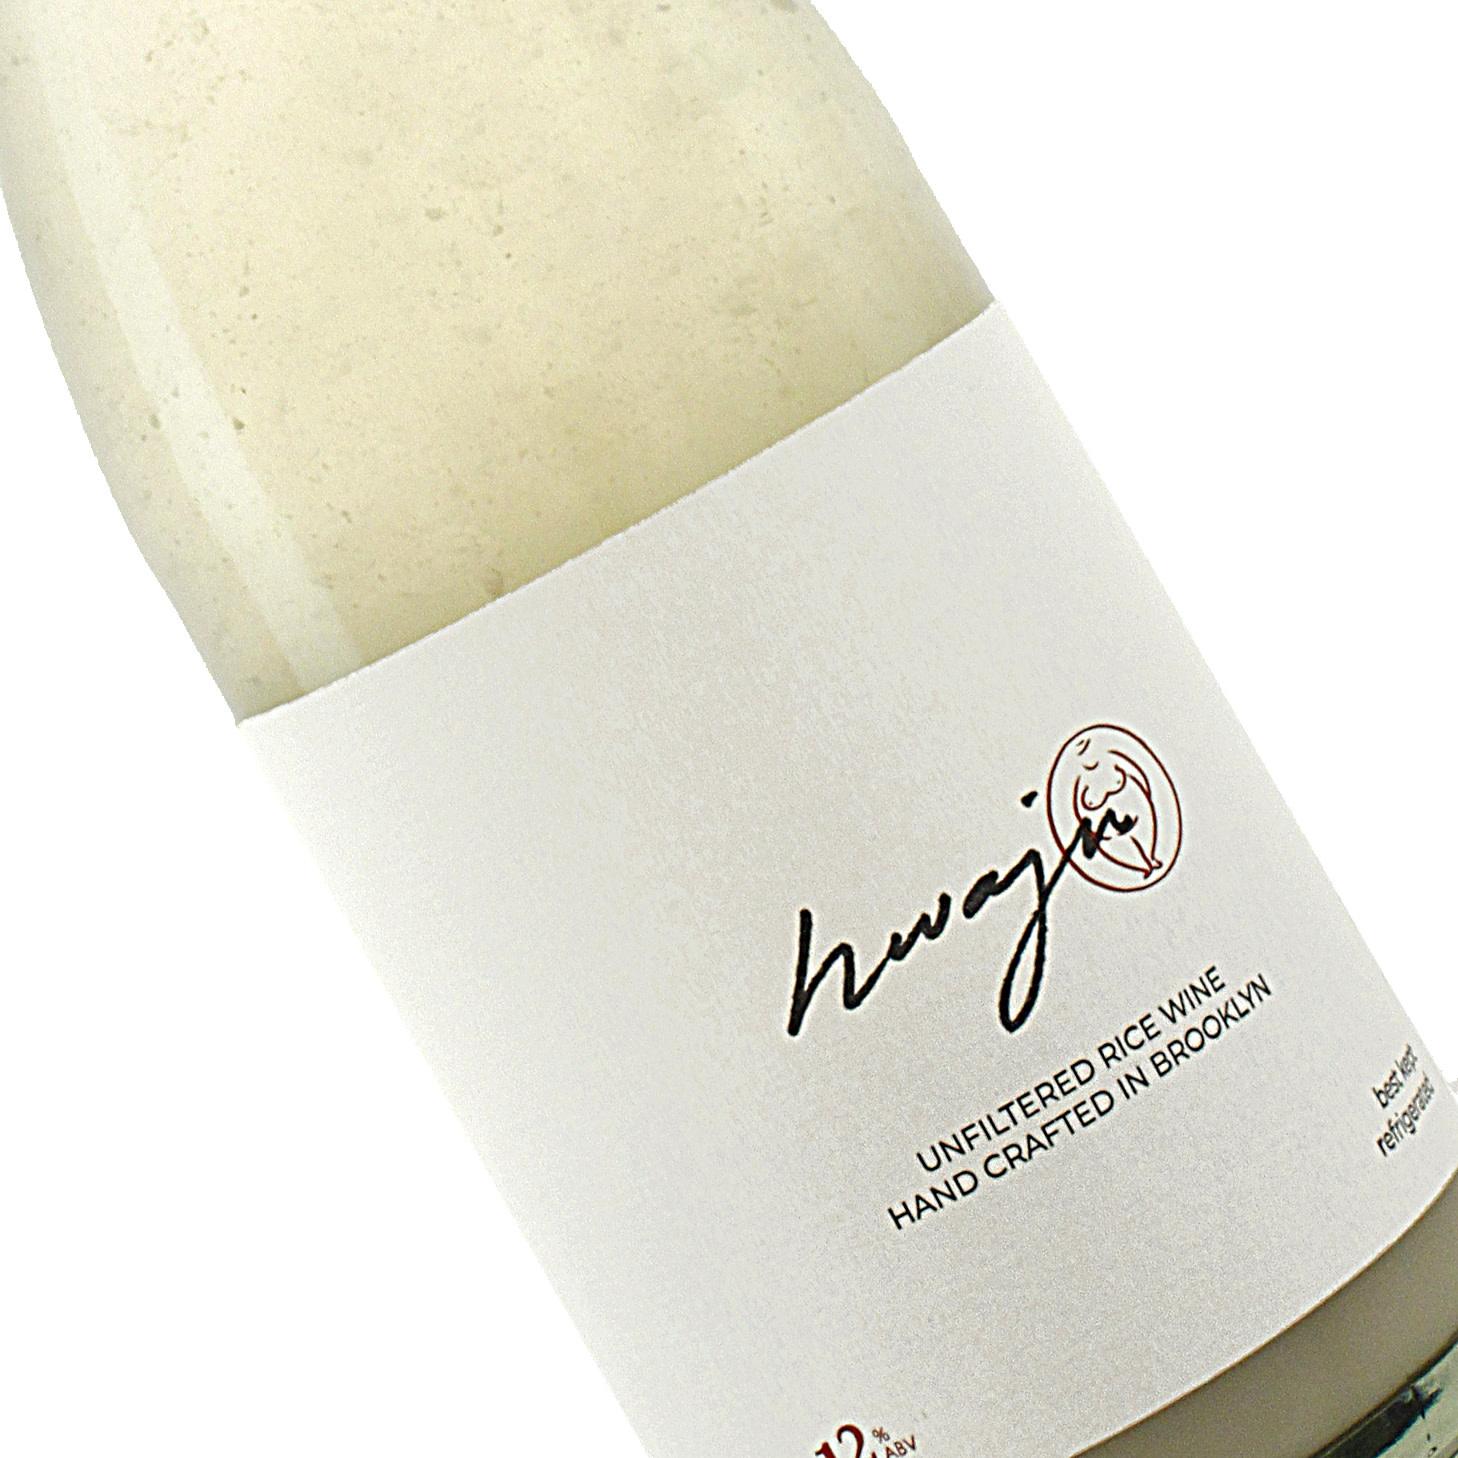 Hana Makgeolli Hwaju Rice Wine, Brooklyn, NY 750ml bottle